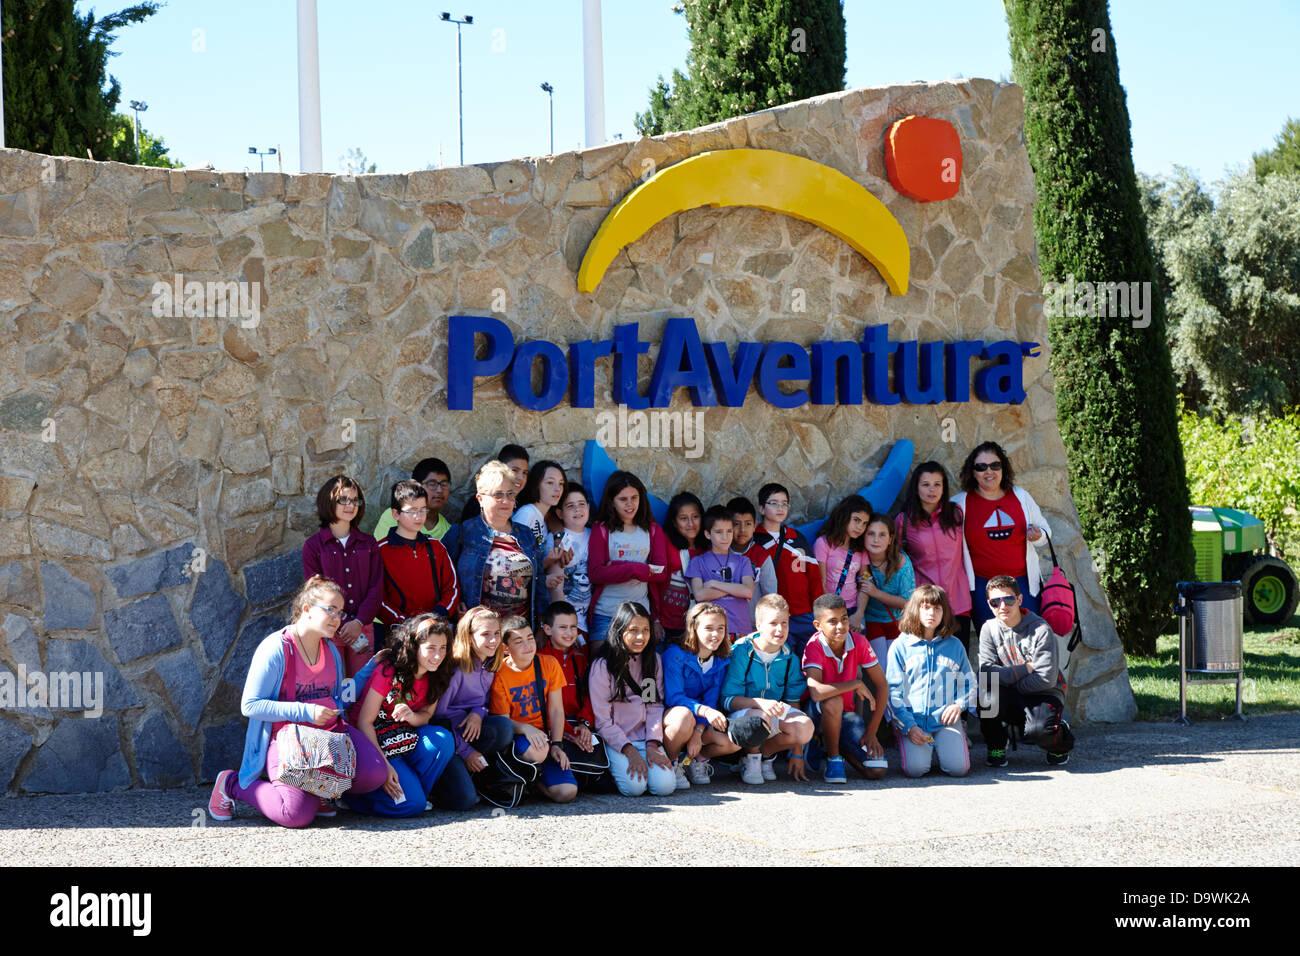 groups of schoolchildren pose for photograph at portaventura theme park salou, catalonia, spain - Stock Image